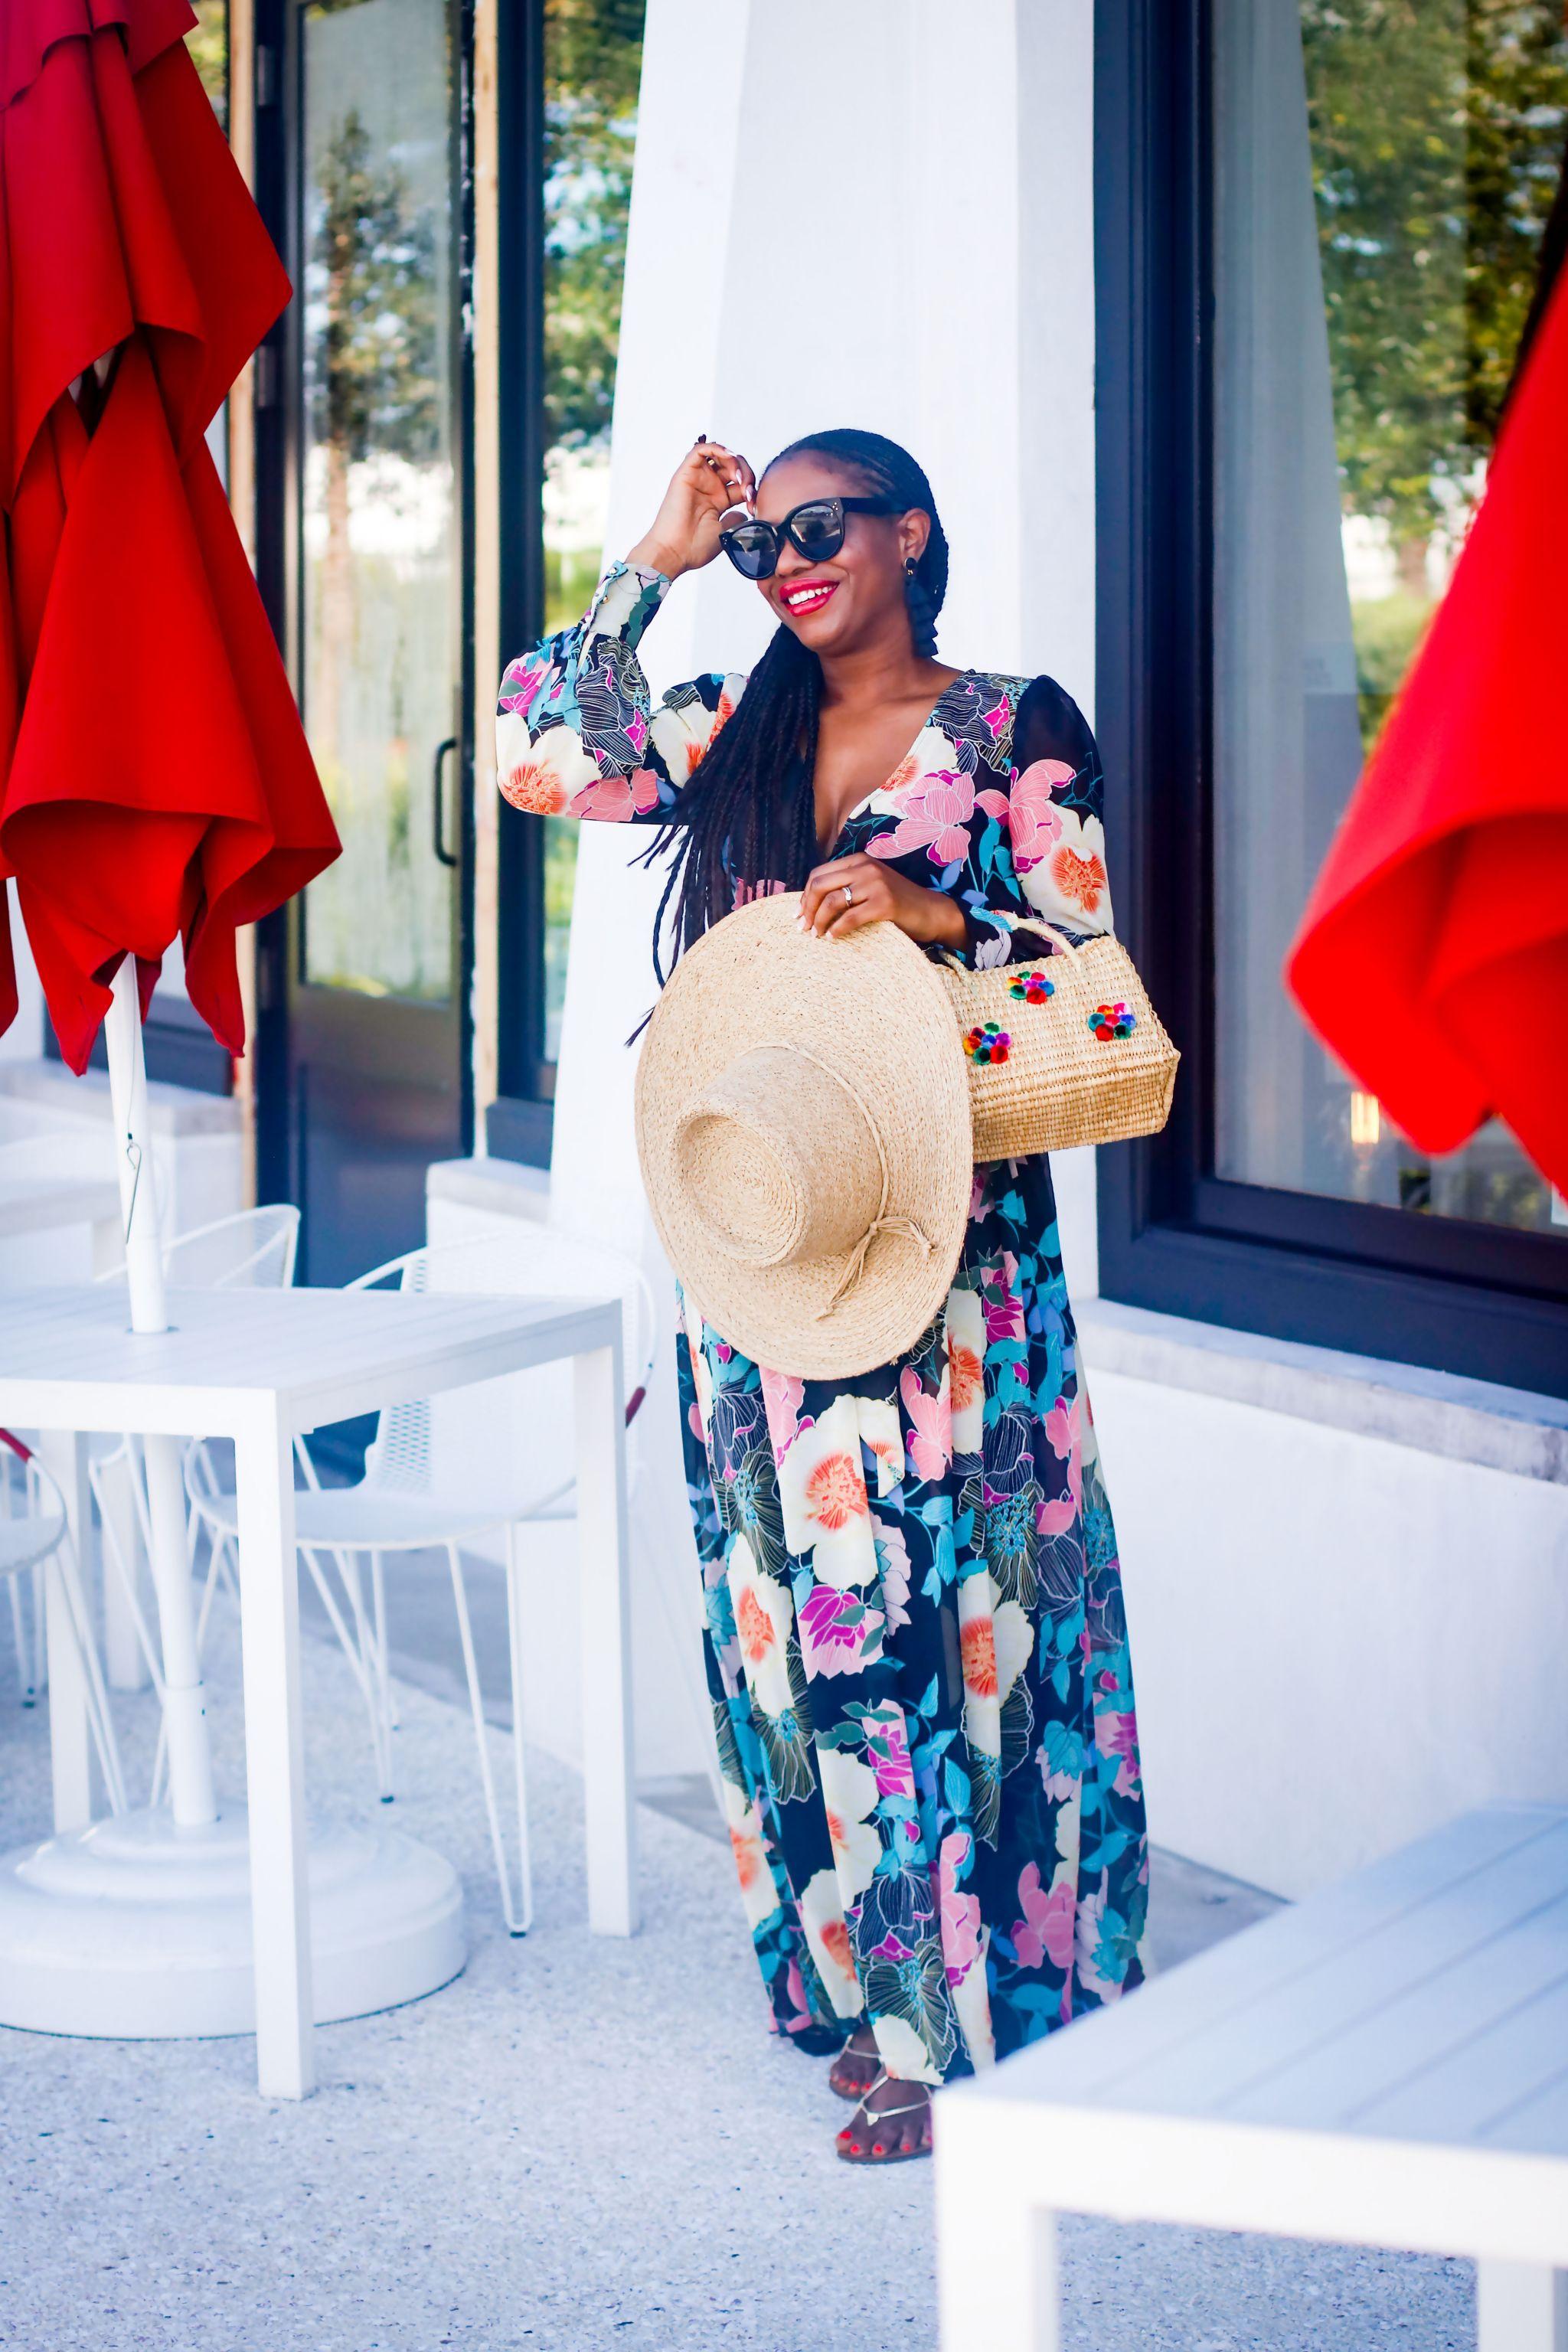 Fashion blogger wearing Maxi dress to the beach.jpg 4